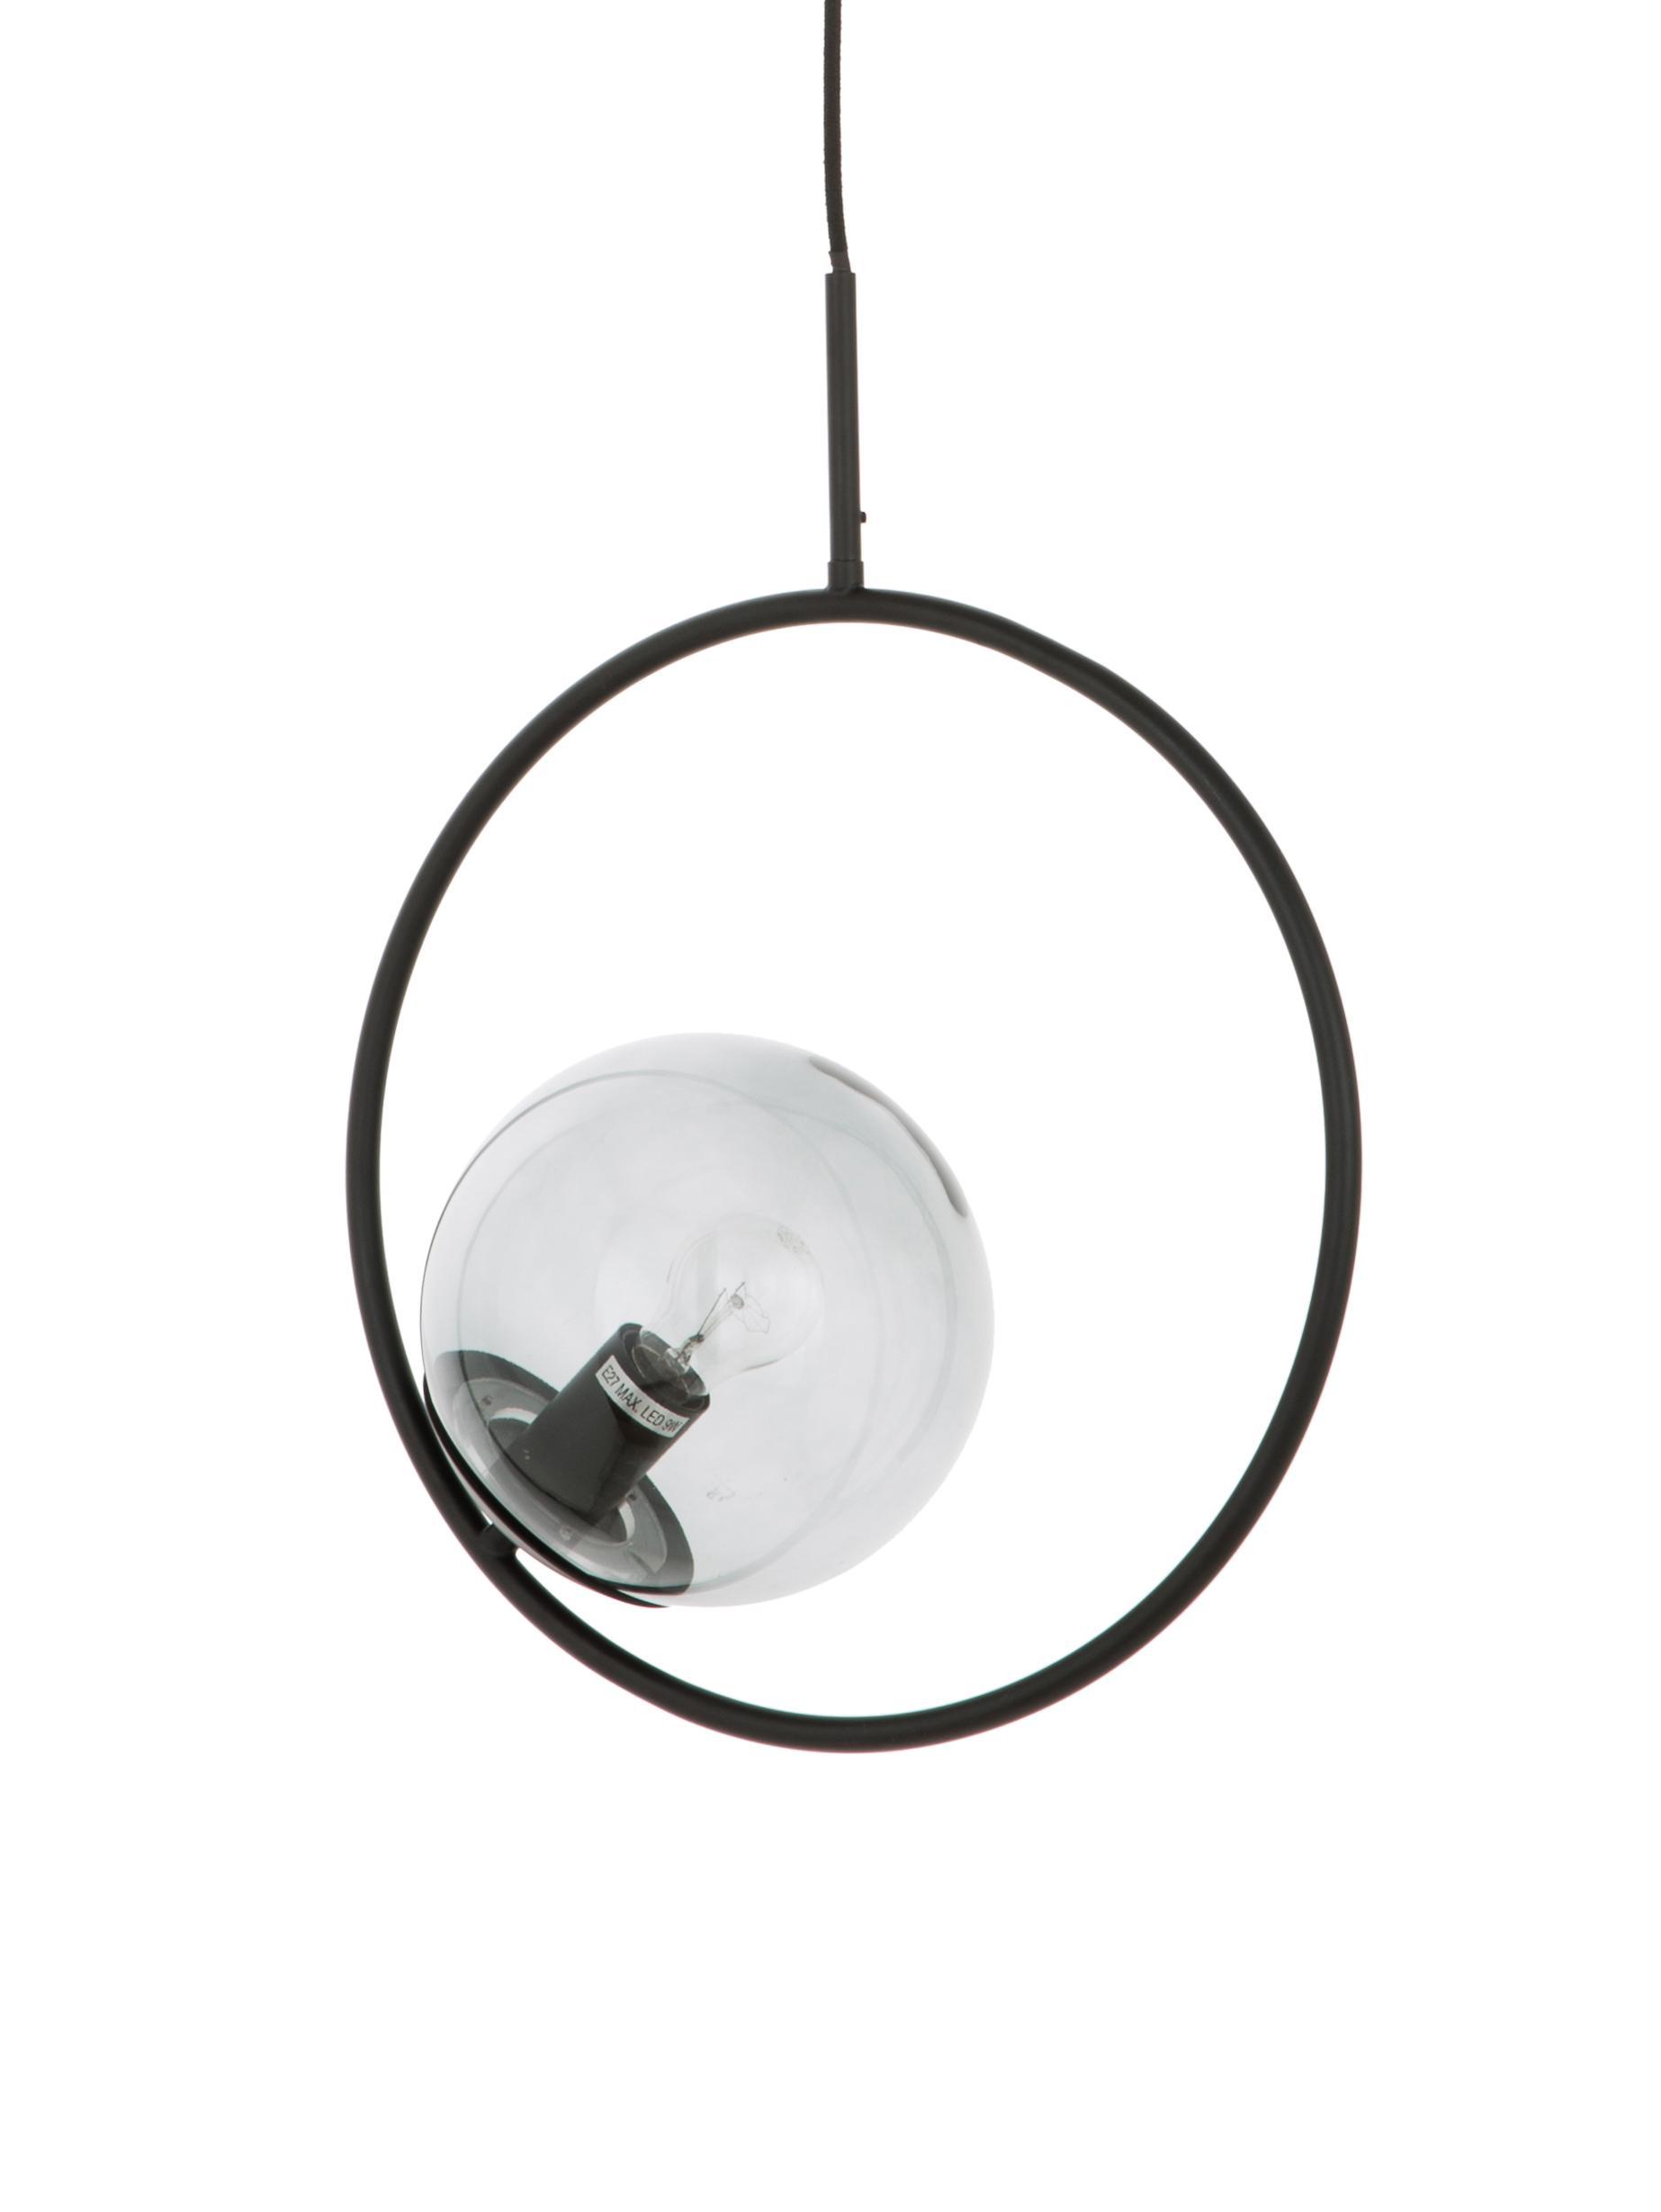 Lámpara de techo Chloe, Pantalla: vidrio, Gris, negro, An 40 x Al 51 cm